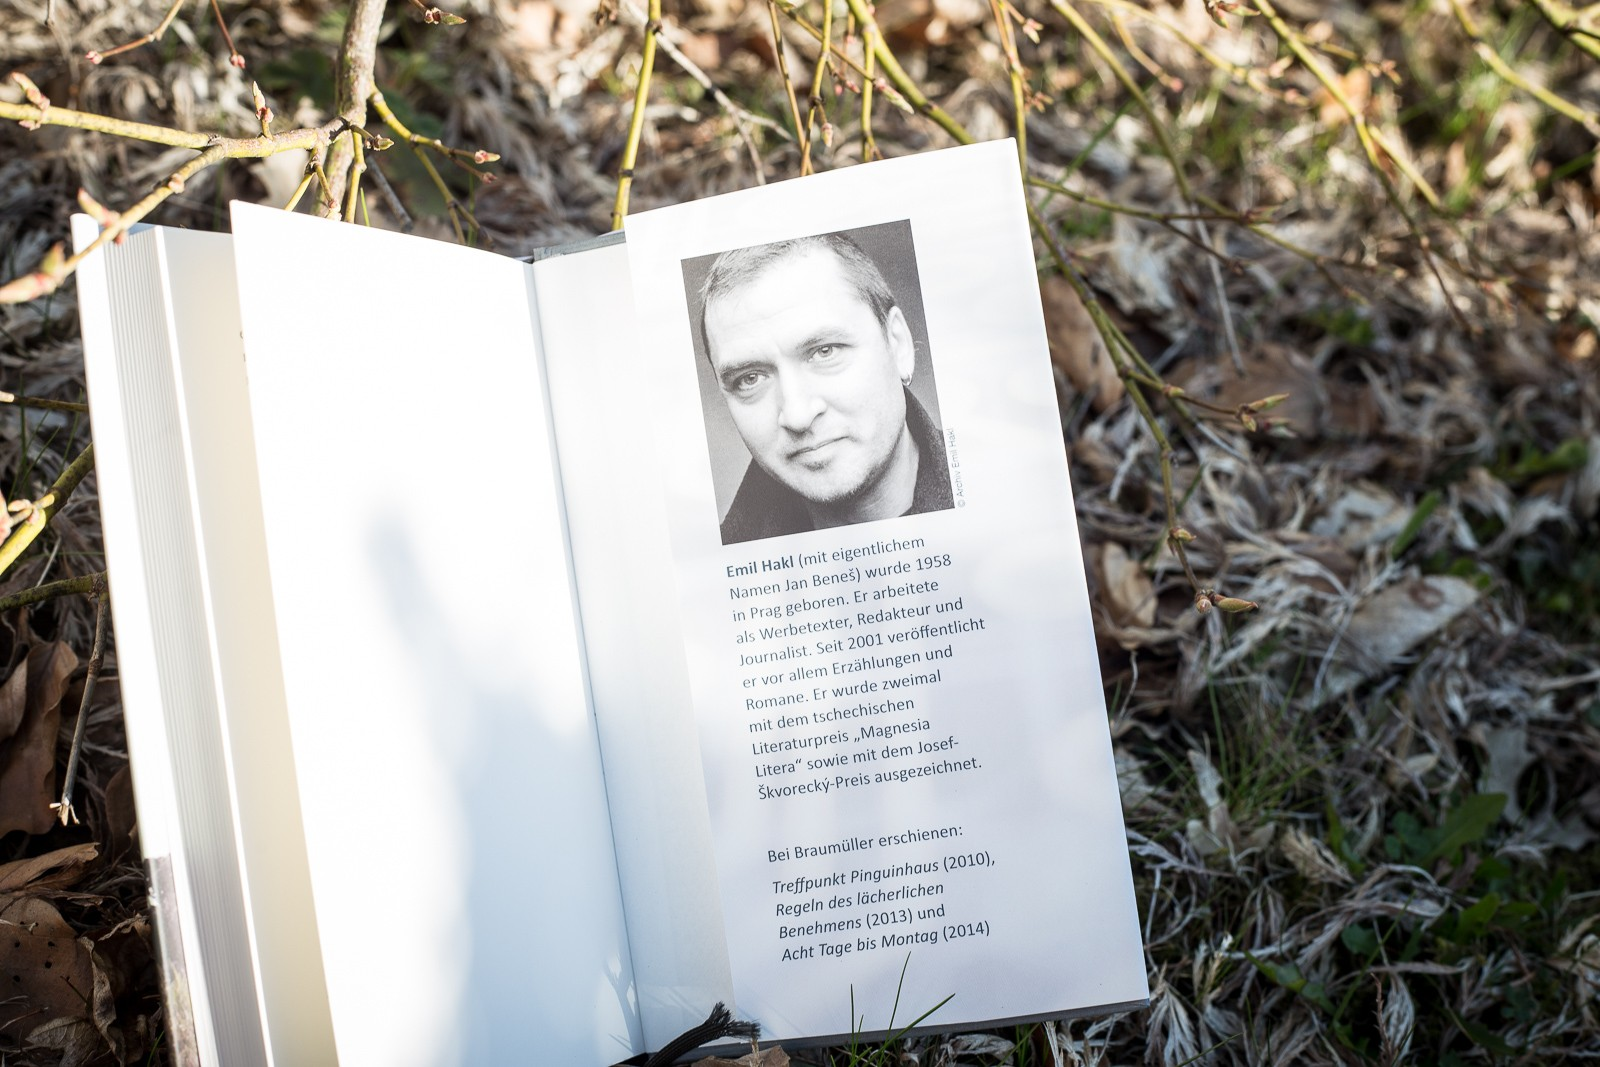 Emil Hakl in Kiras Version